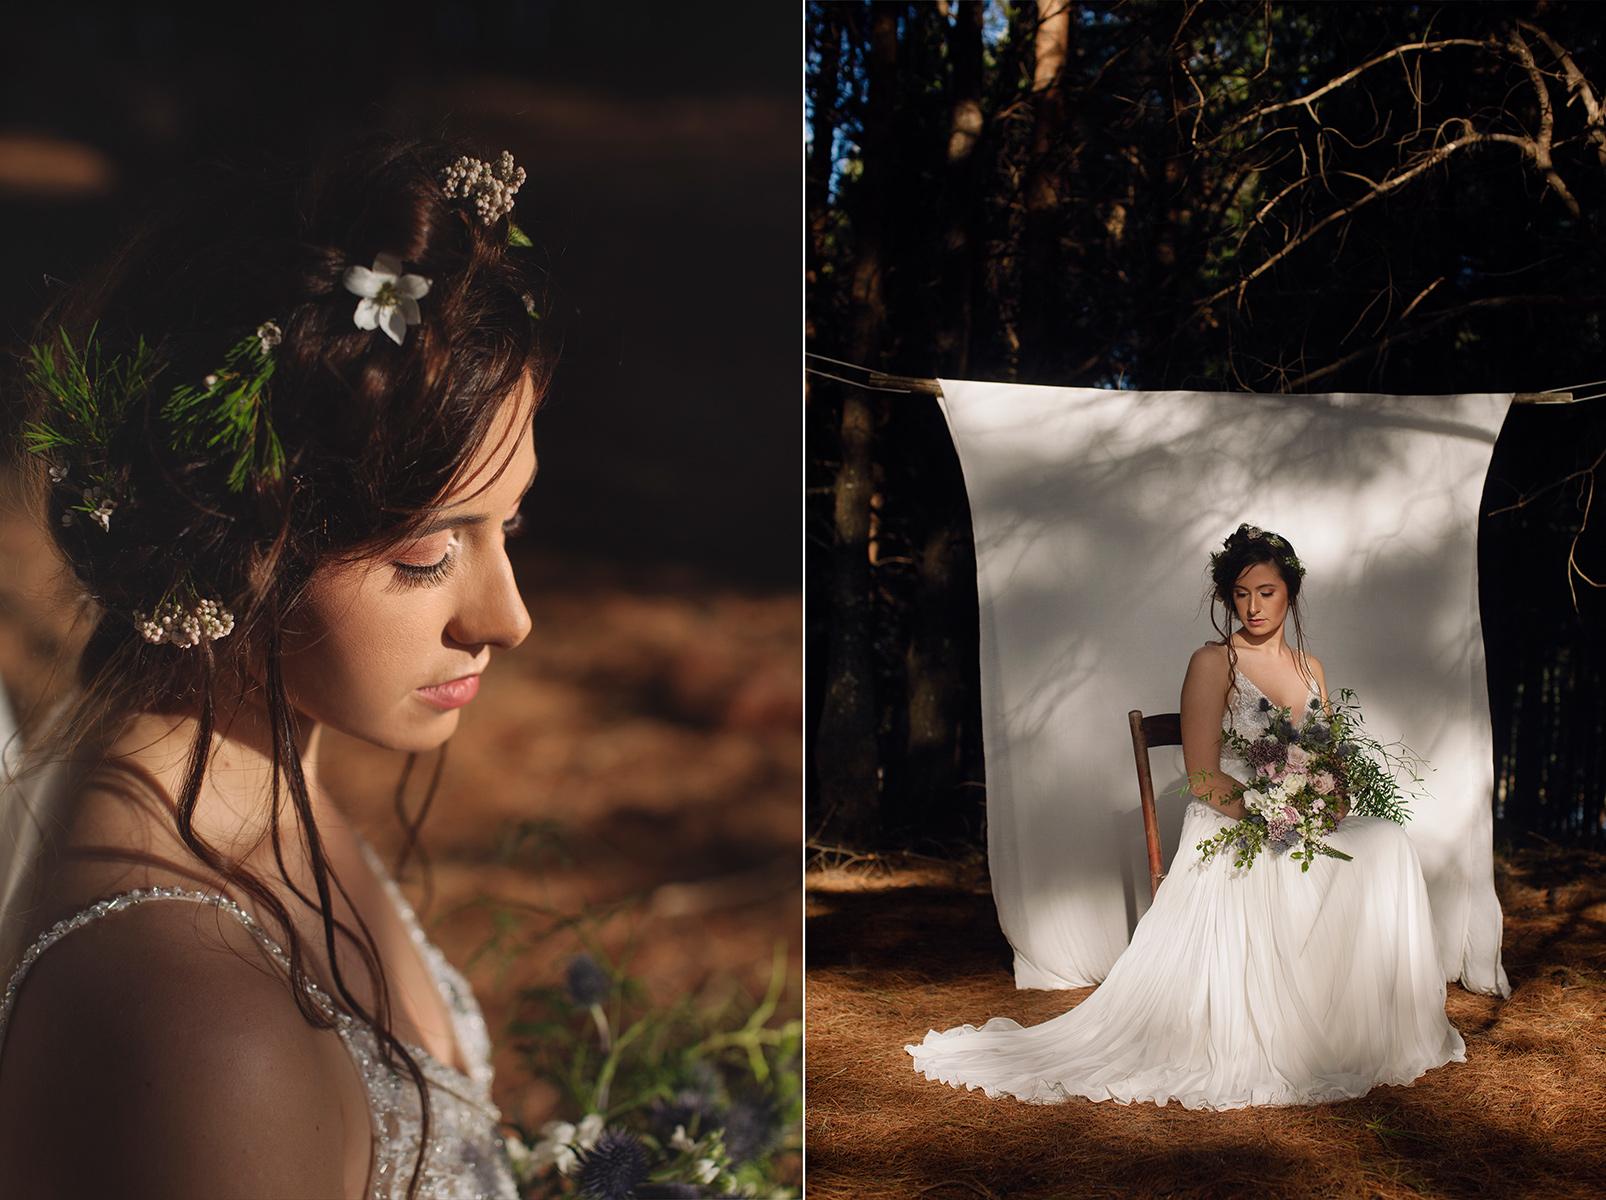 Bridal11Nov2018_HMP_Combo14.jpg